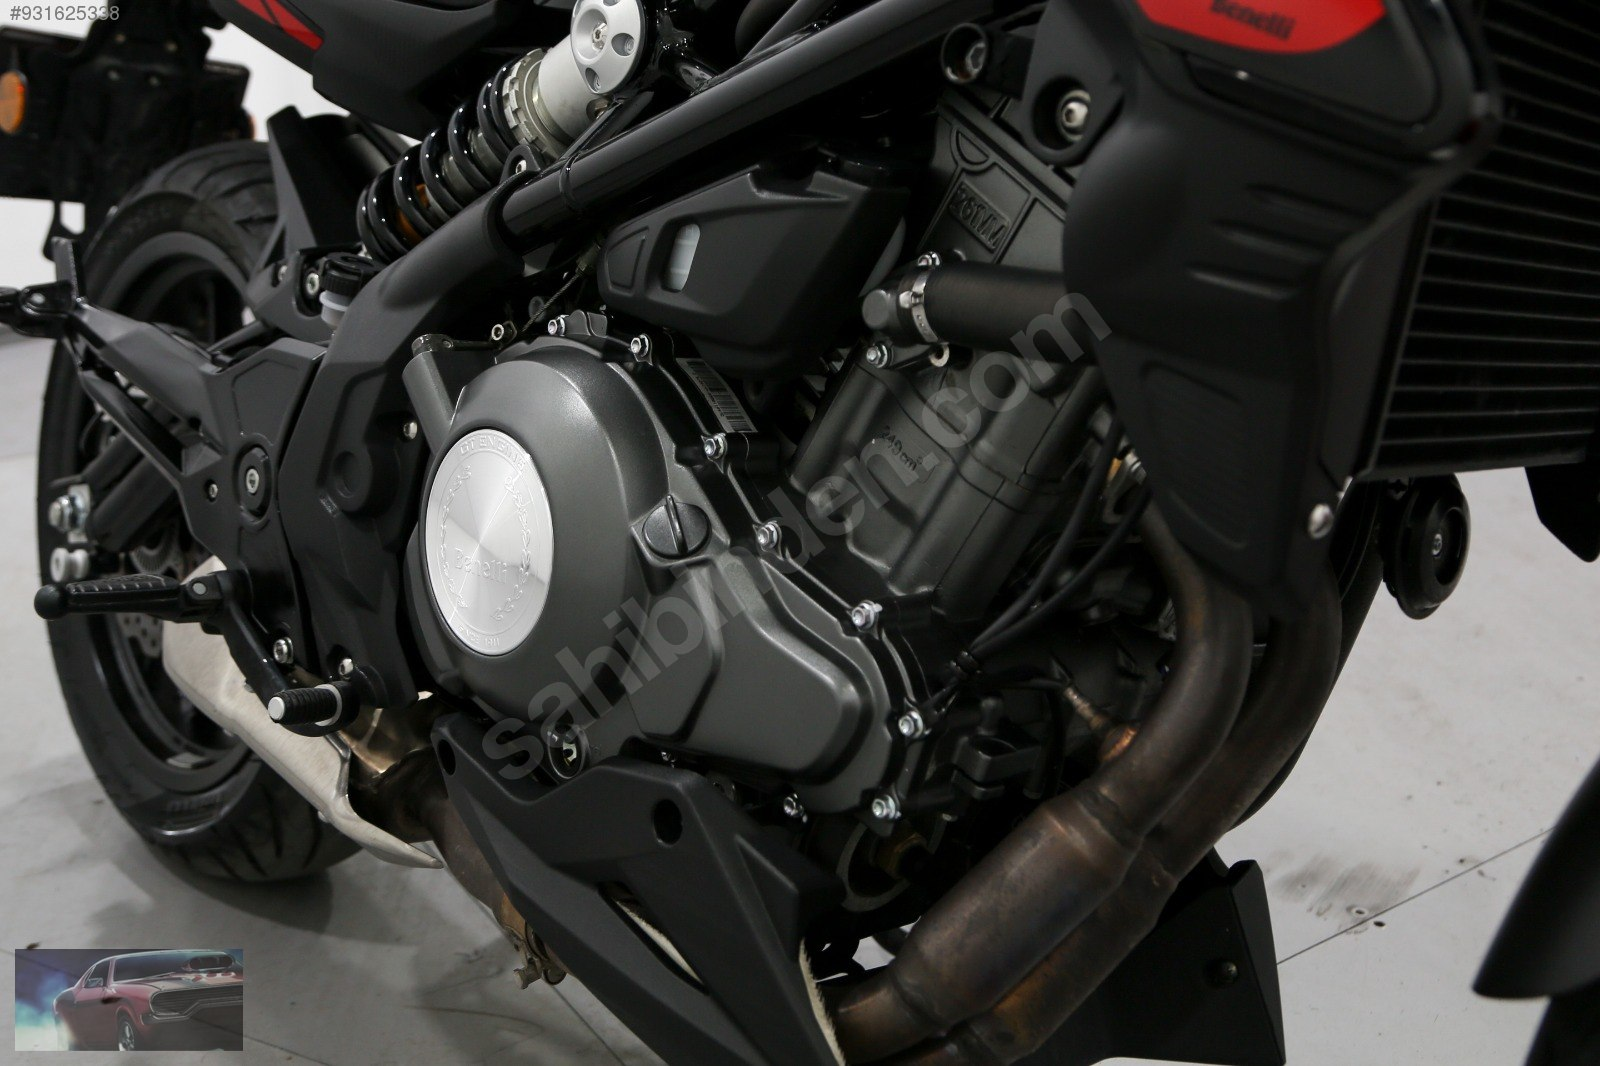 Benelli Leoncino 2018 Model Naked / Roadster Motor